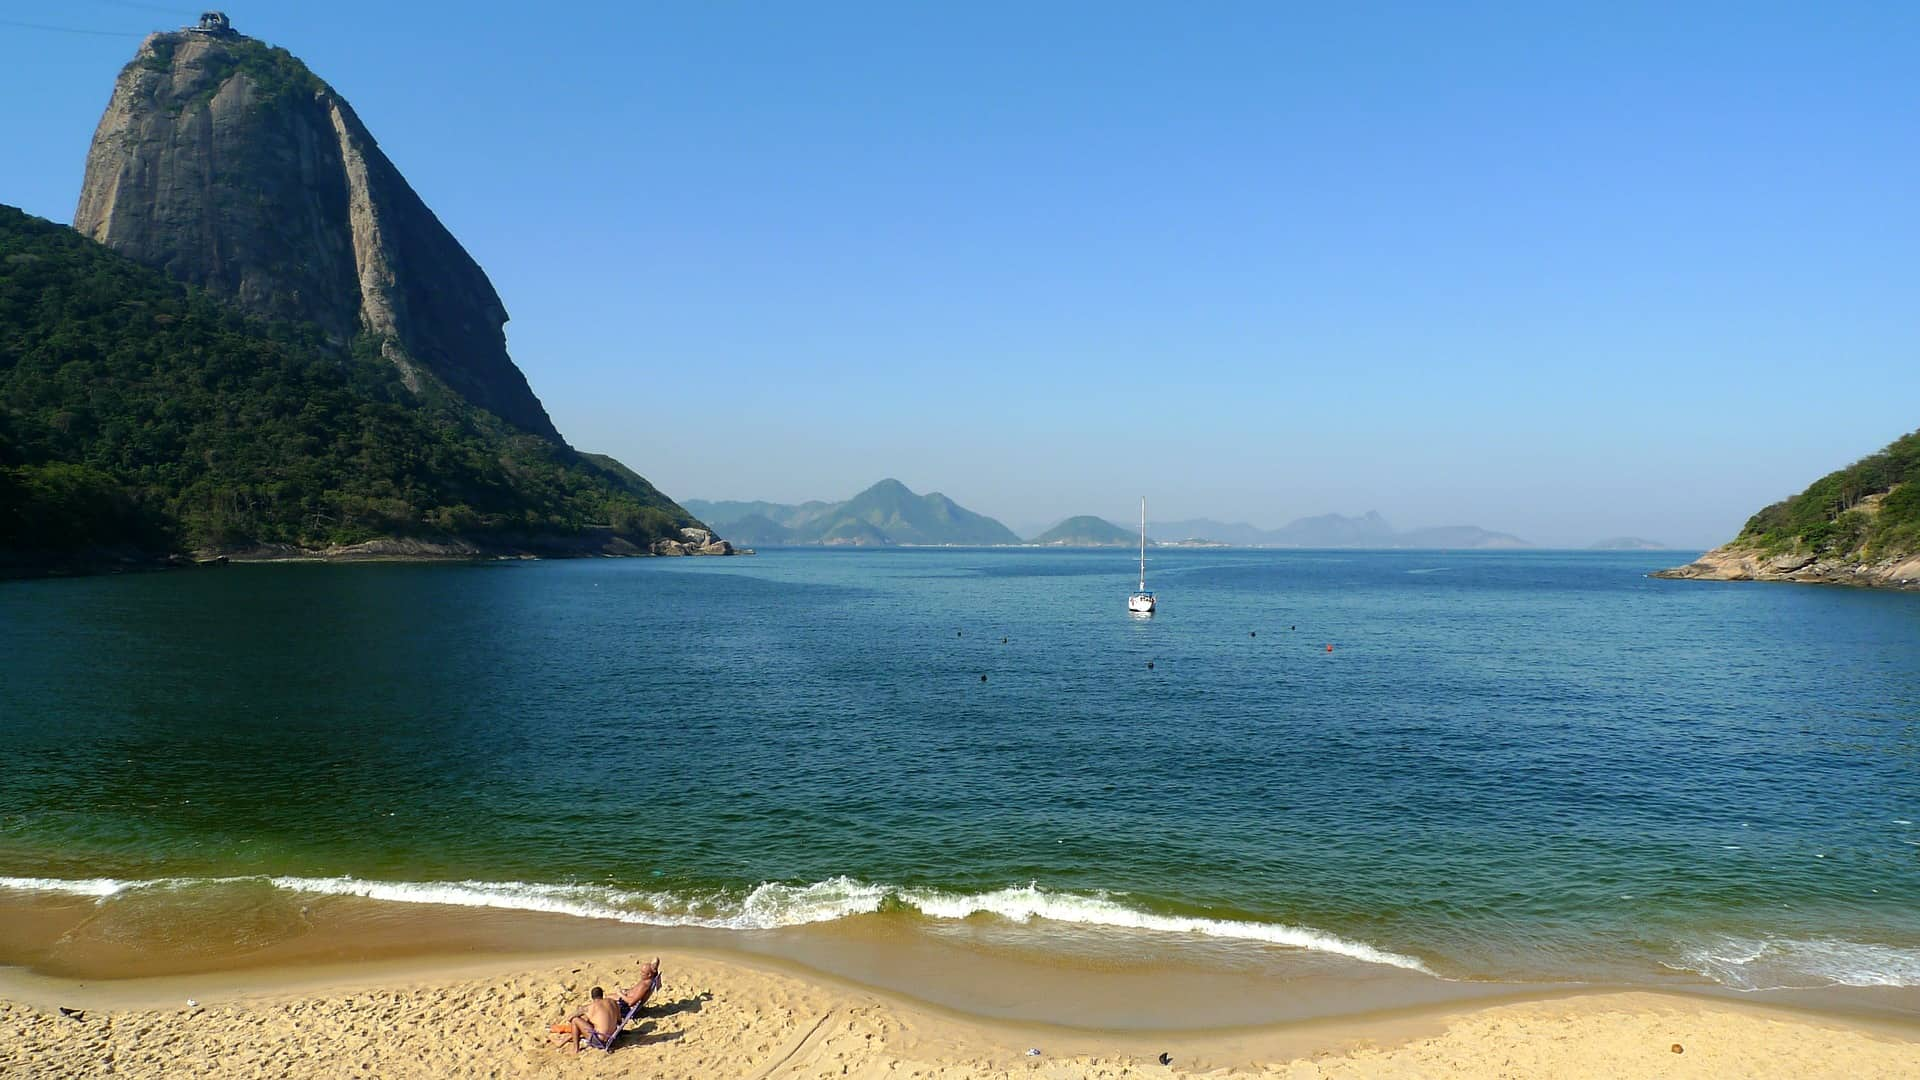 Strand in Rio de Janeiro am Zuckerhut